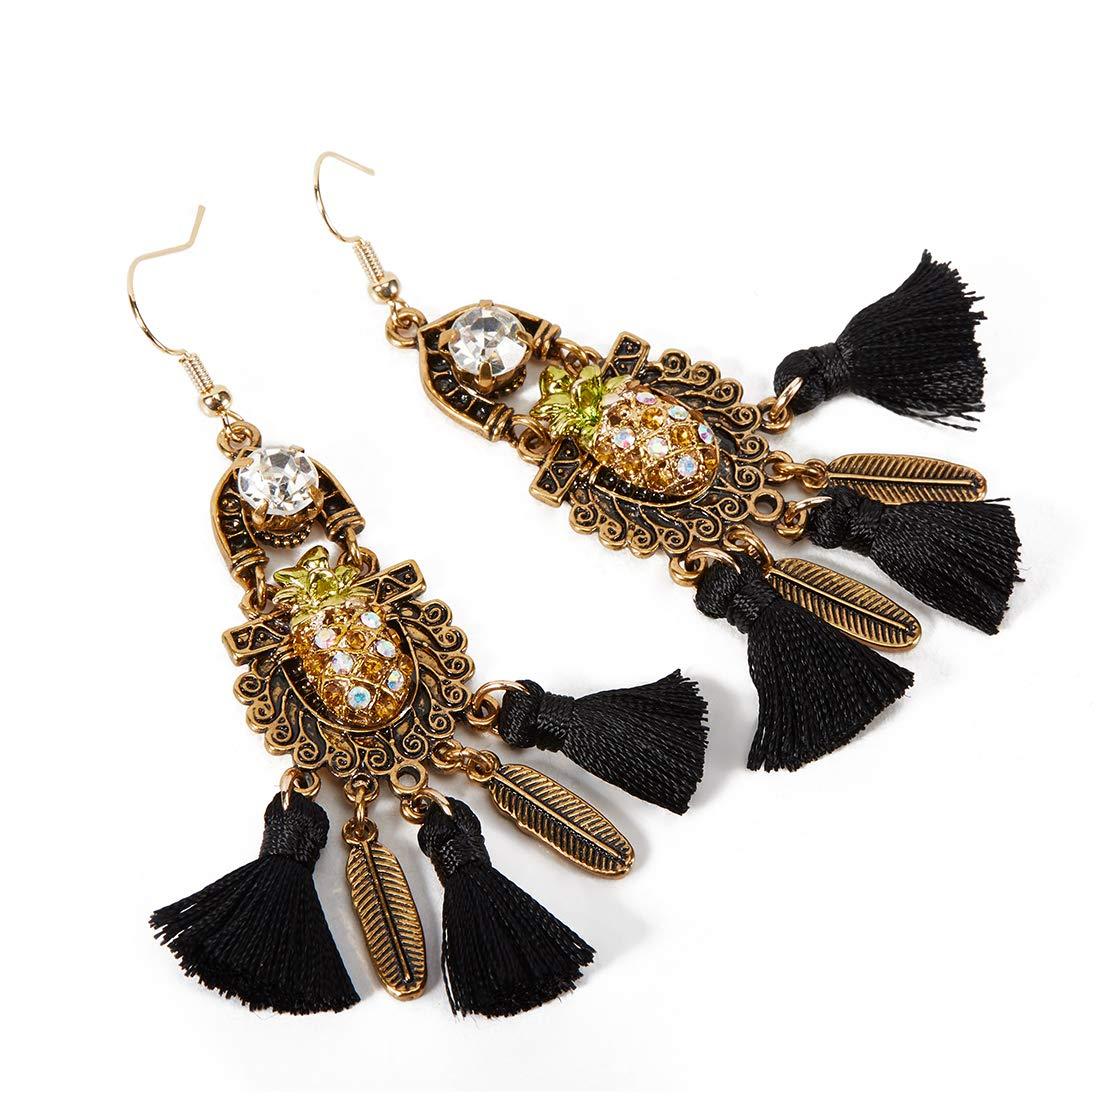 QANCI Colorful Layered Tassel Earrings Baroque Dangle Drop Tiered Druzy Stud Earrings for Women Girls Gifts (Style B)